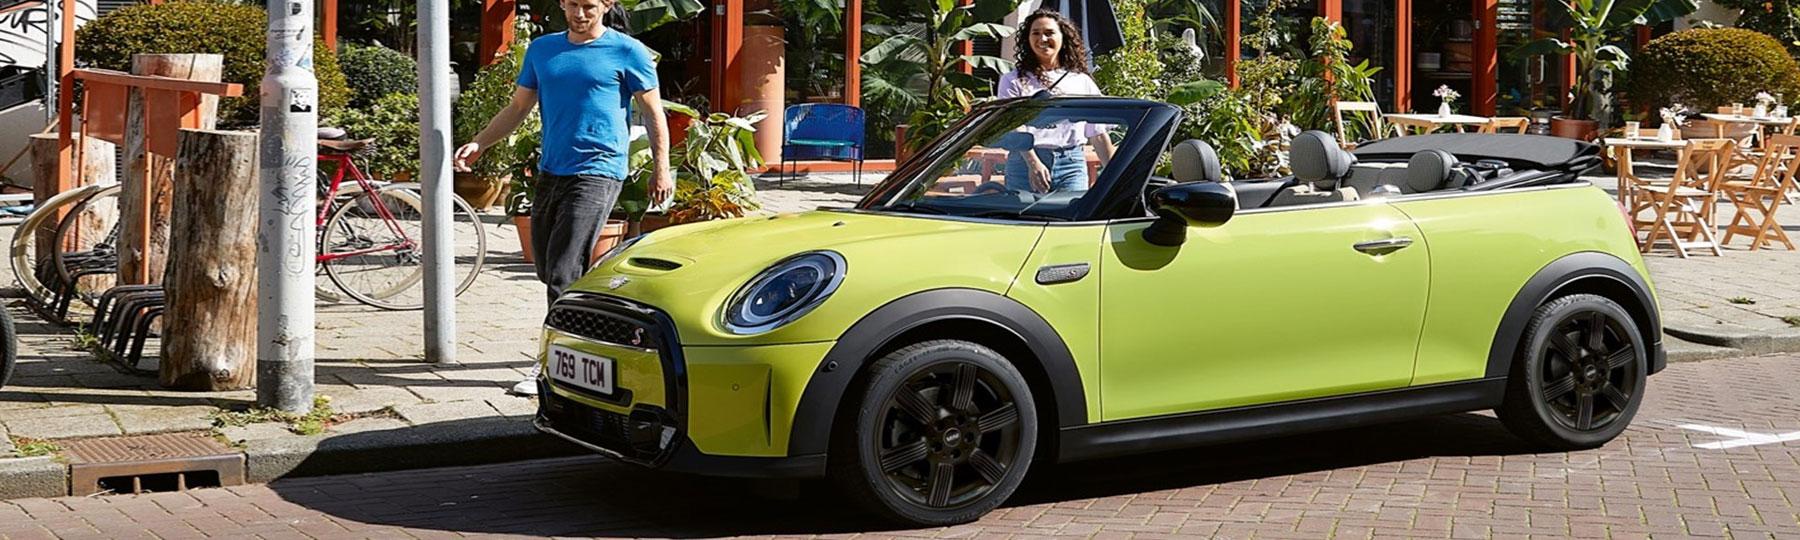 MINI Convertible New Car Offer